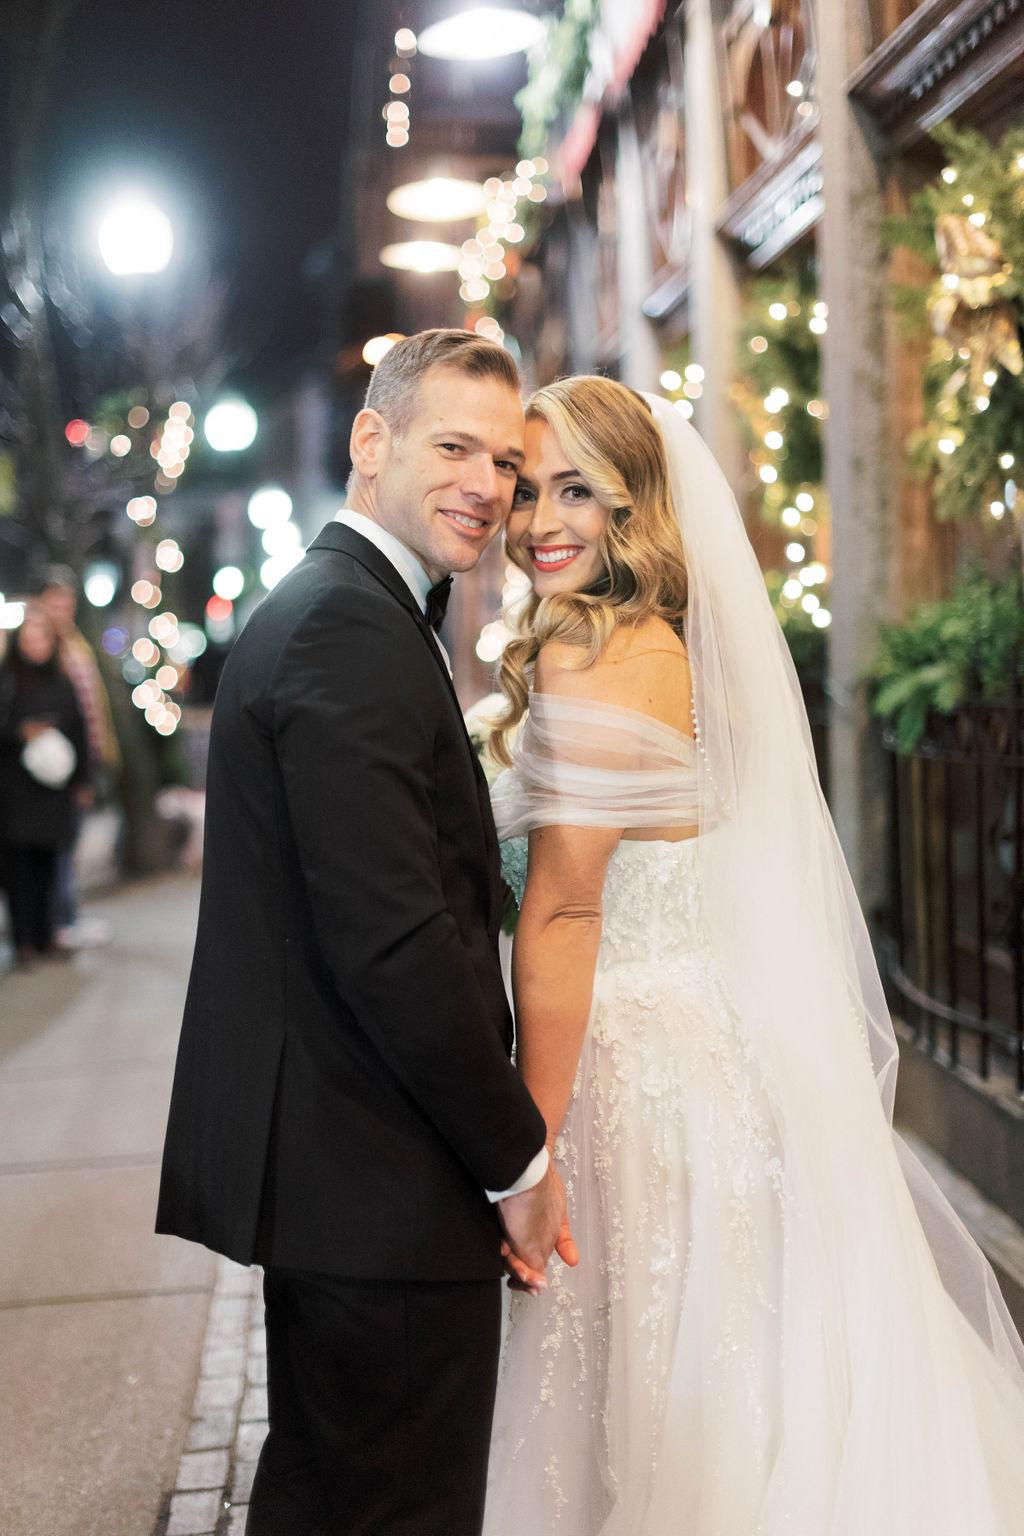 Luxe Chic Winter Wedding in Boston